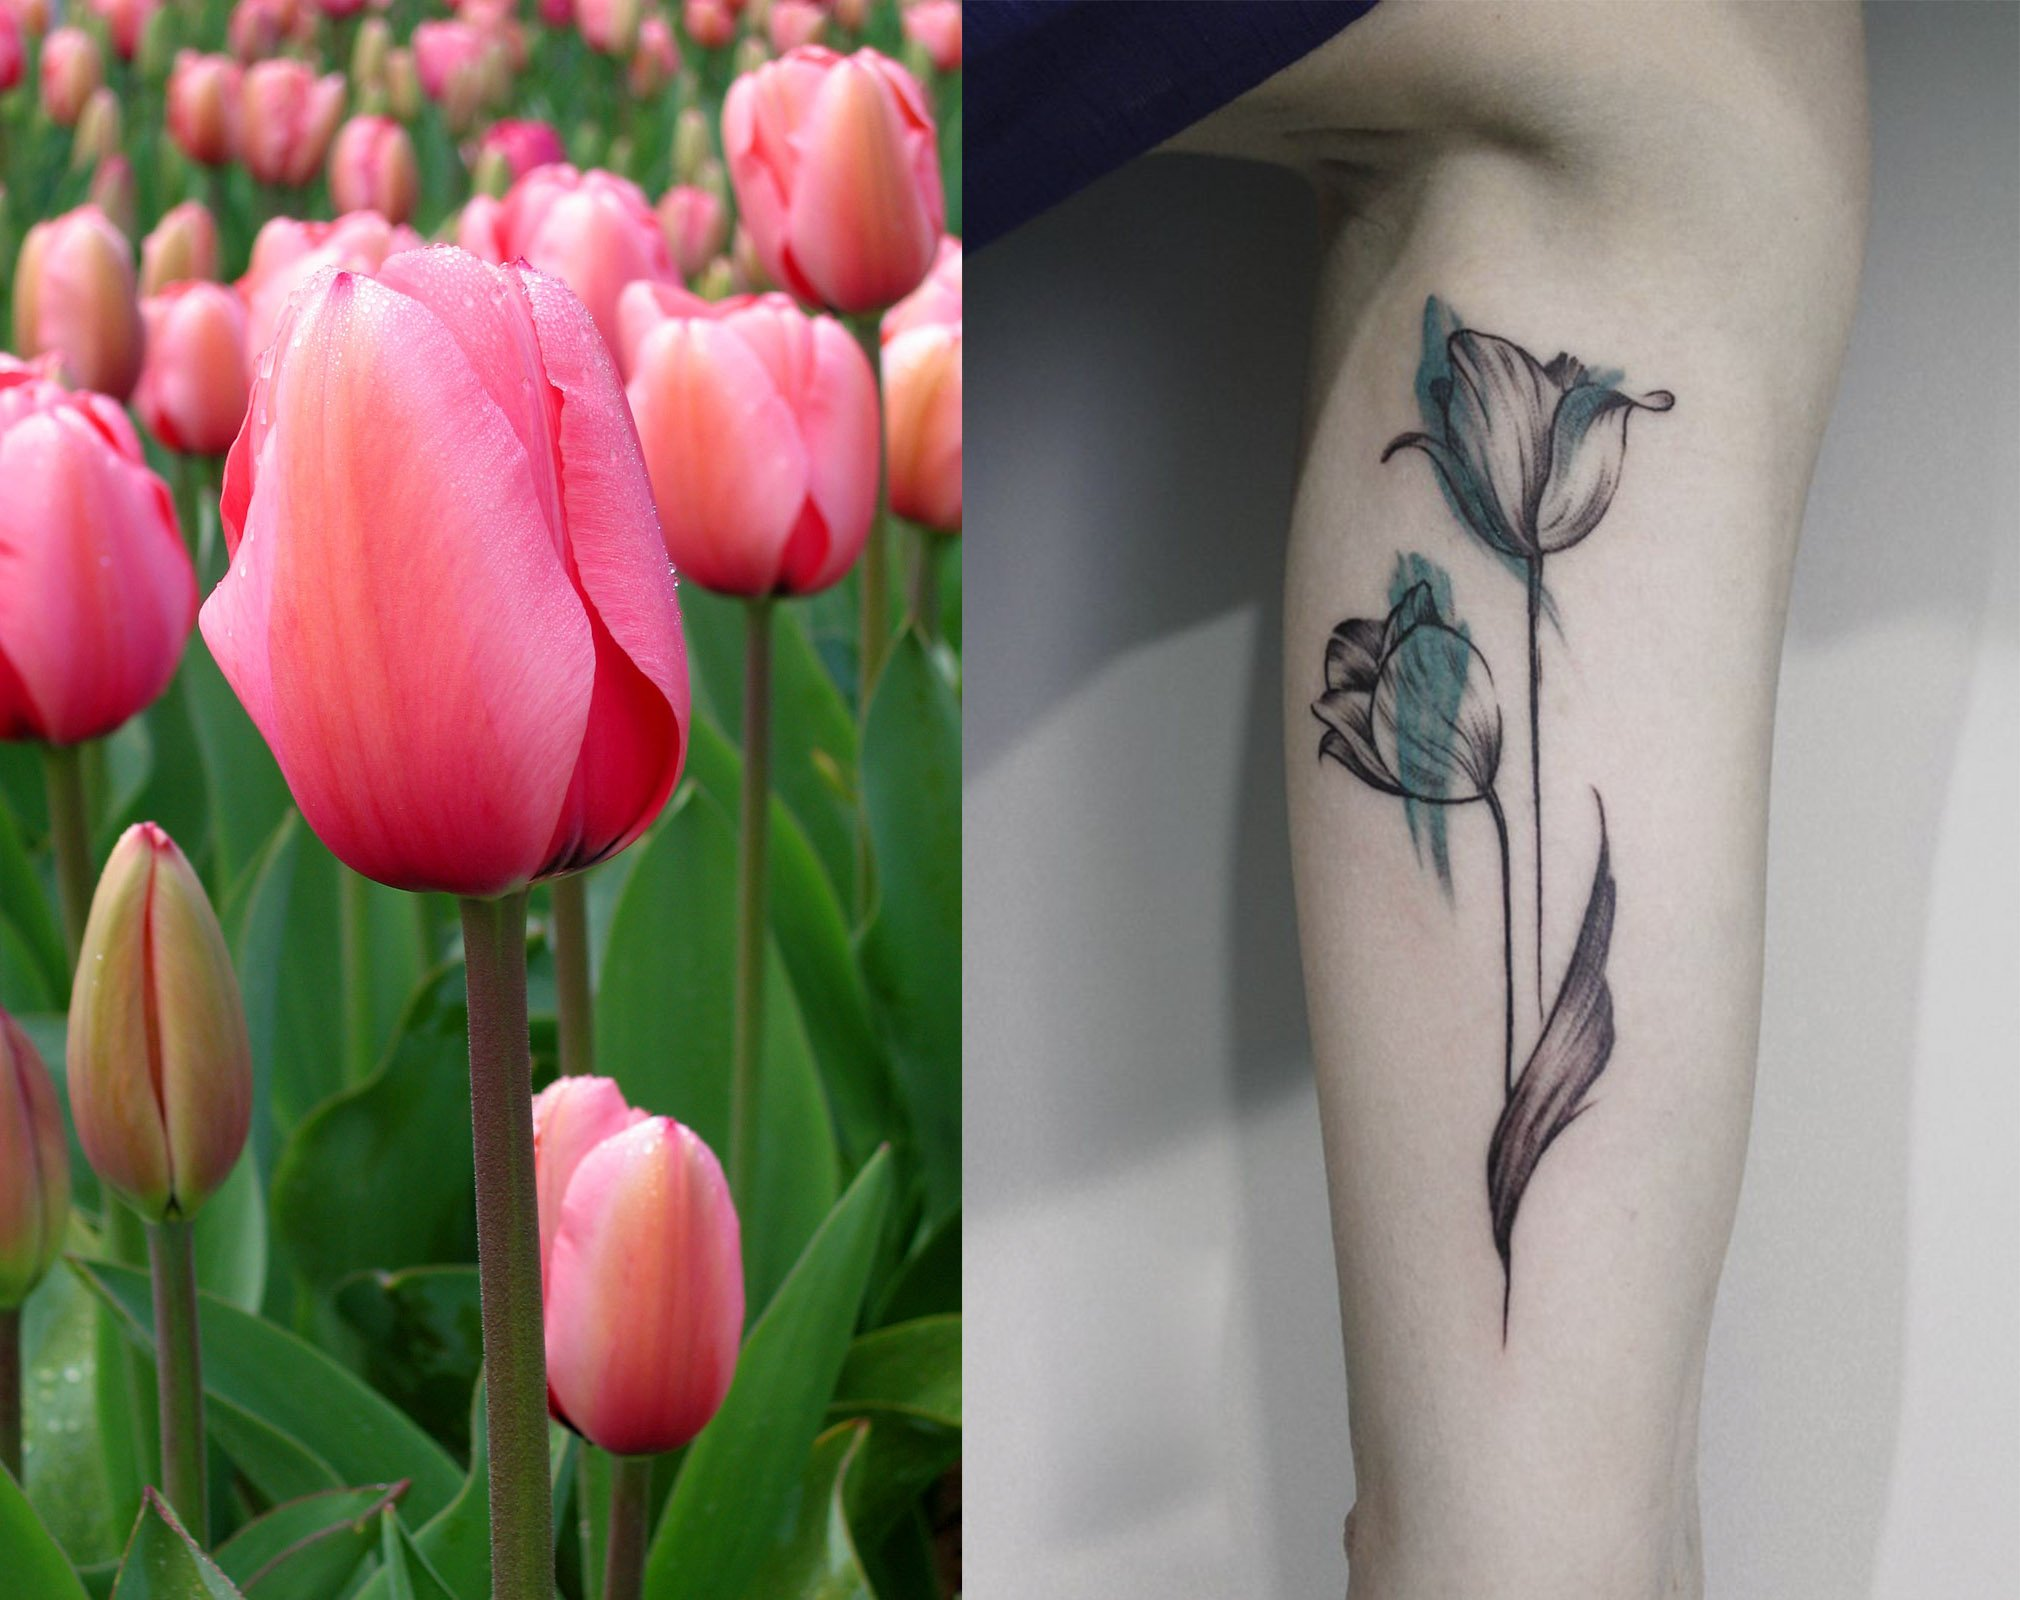 191 Qu 233 Flor Deber 237 As Tatuarte Seg 250 N Tu Signo Del Zodiaco